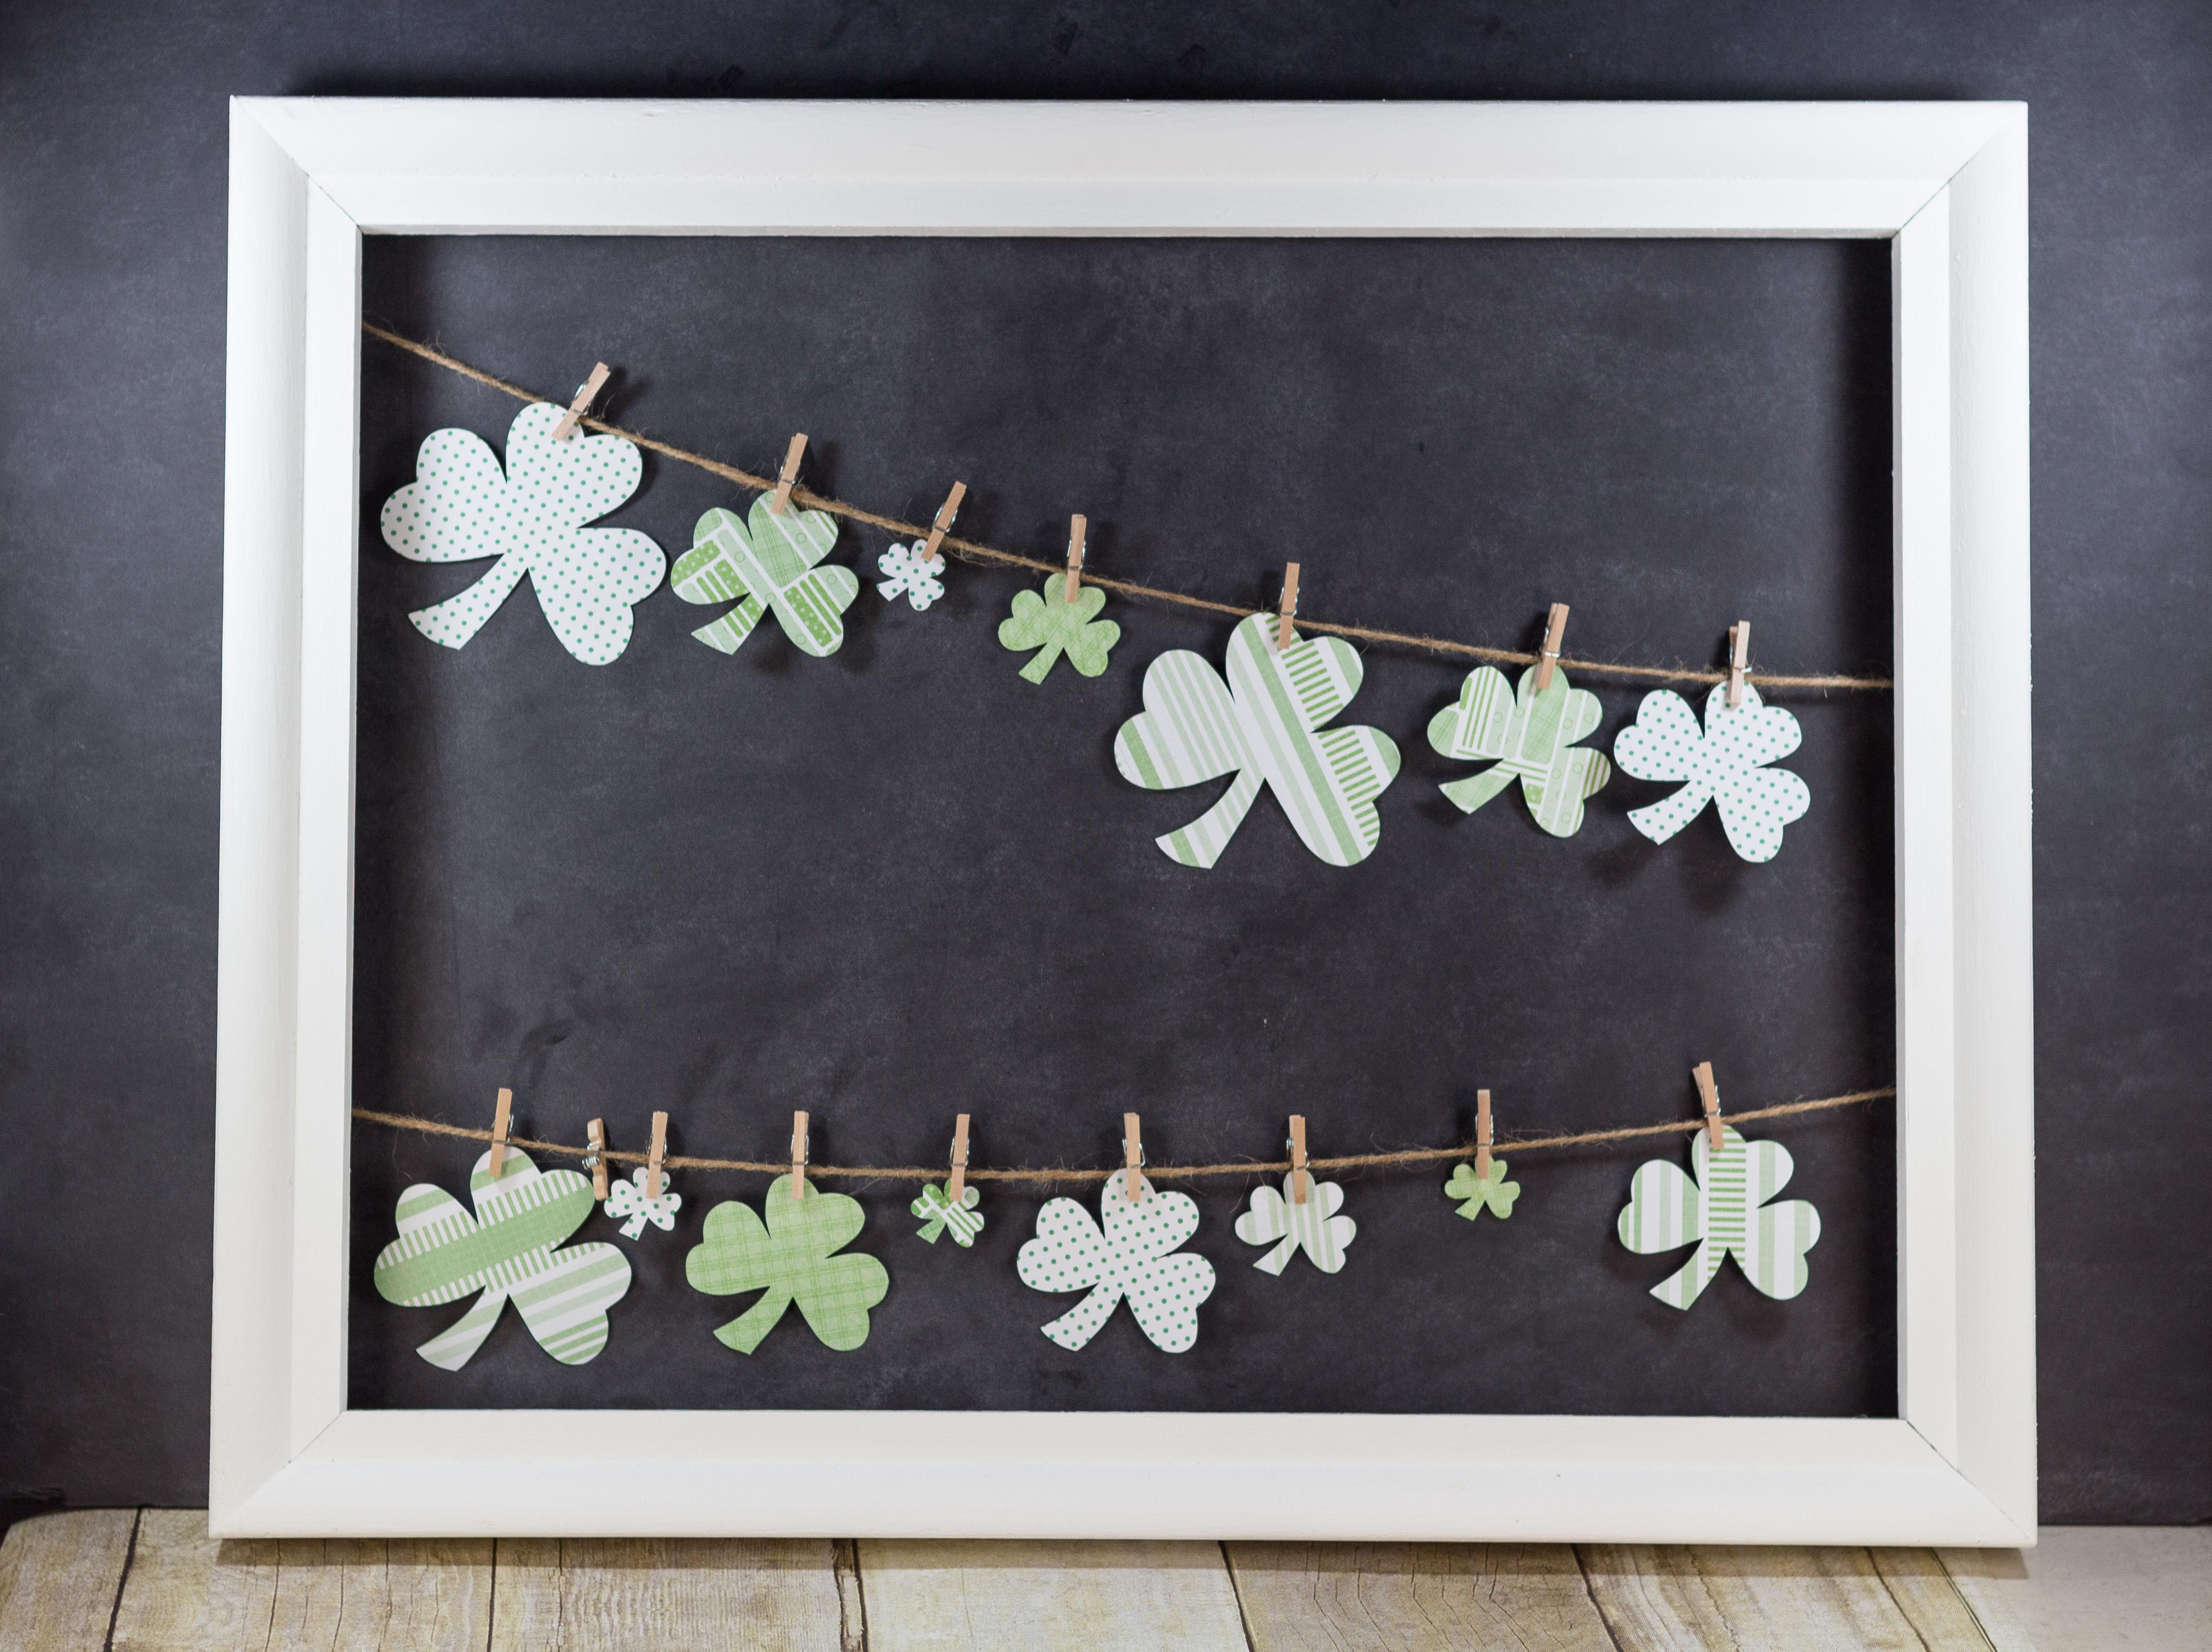 DIY St. Patrick's Day Shamrocks Hanging in Open White Frame | https://www.roseclearfield.com